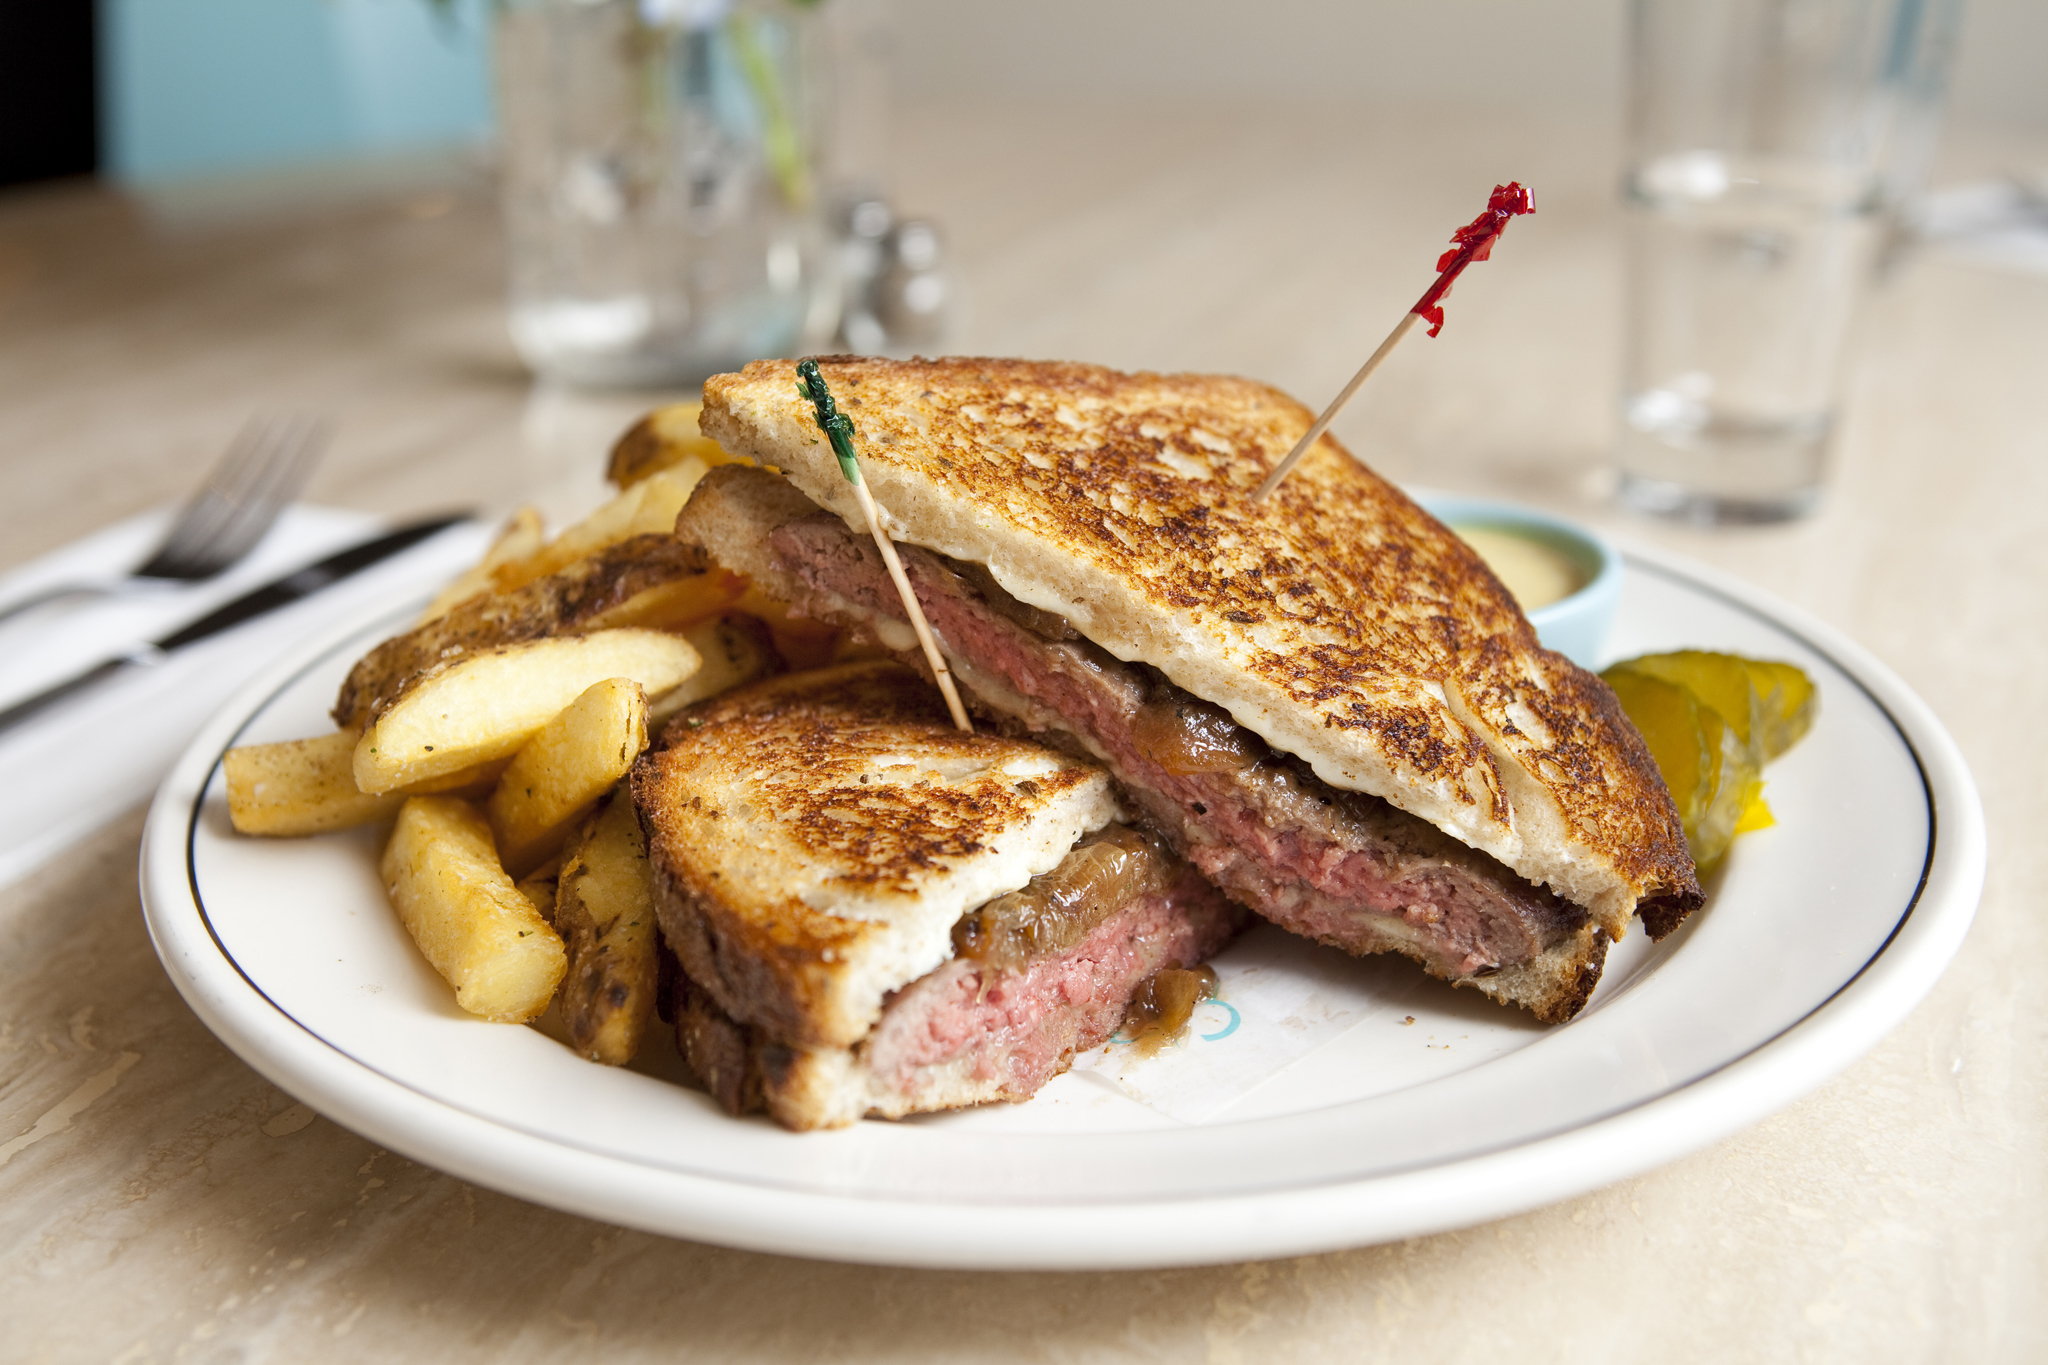 Best sandwiches in New York City in 2013